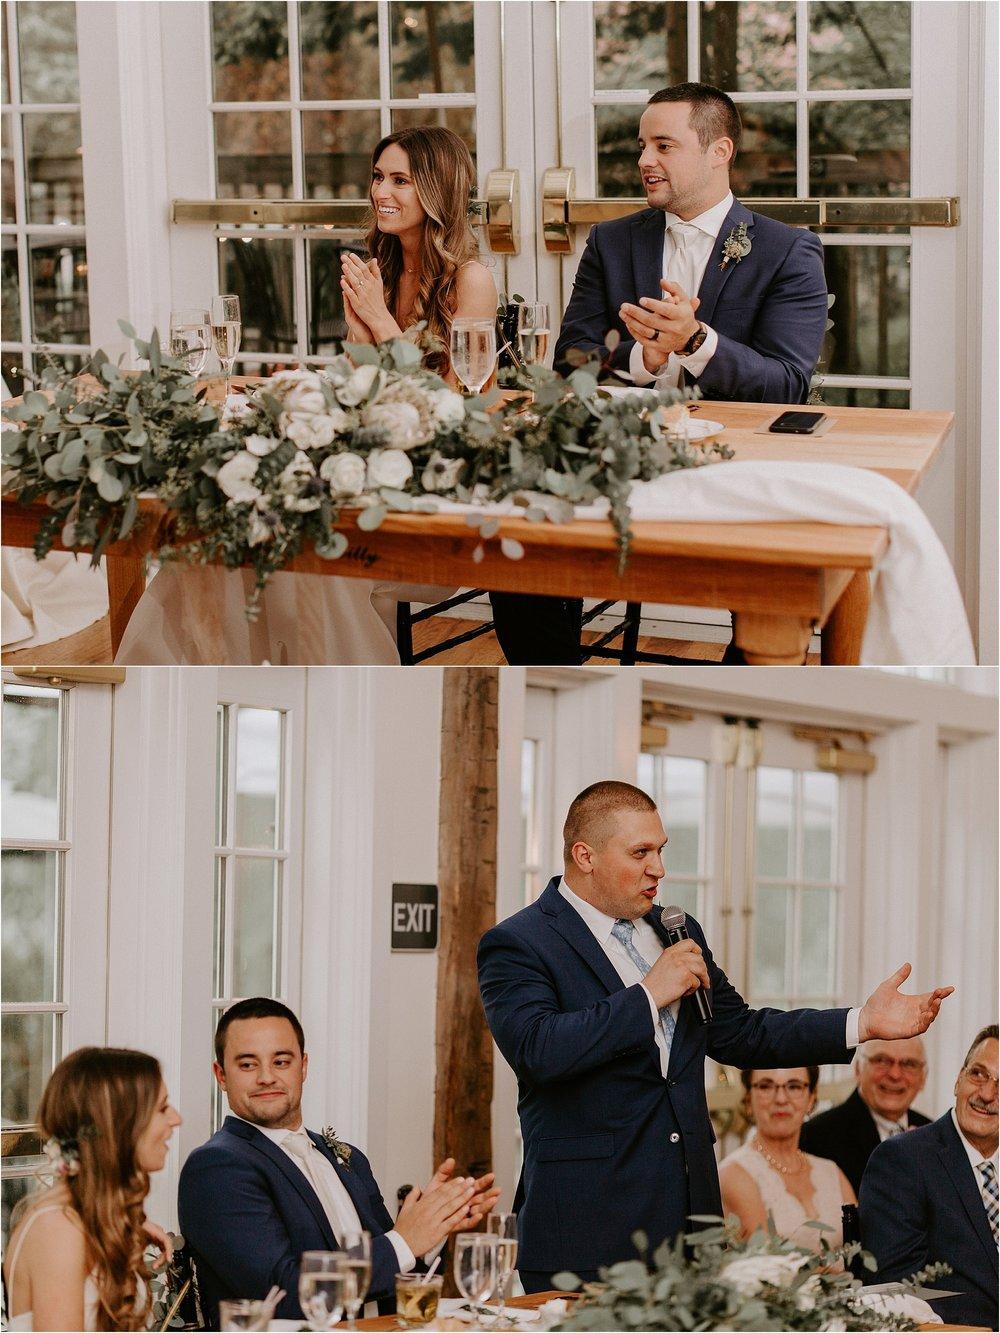 Sarah_Brookhart_Lancaster_PA_Wedding_Photographer_0068.jpg